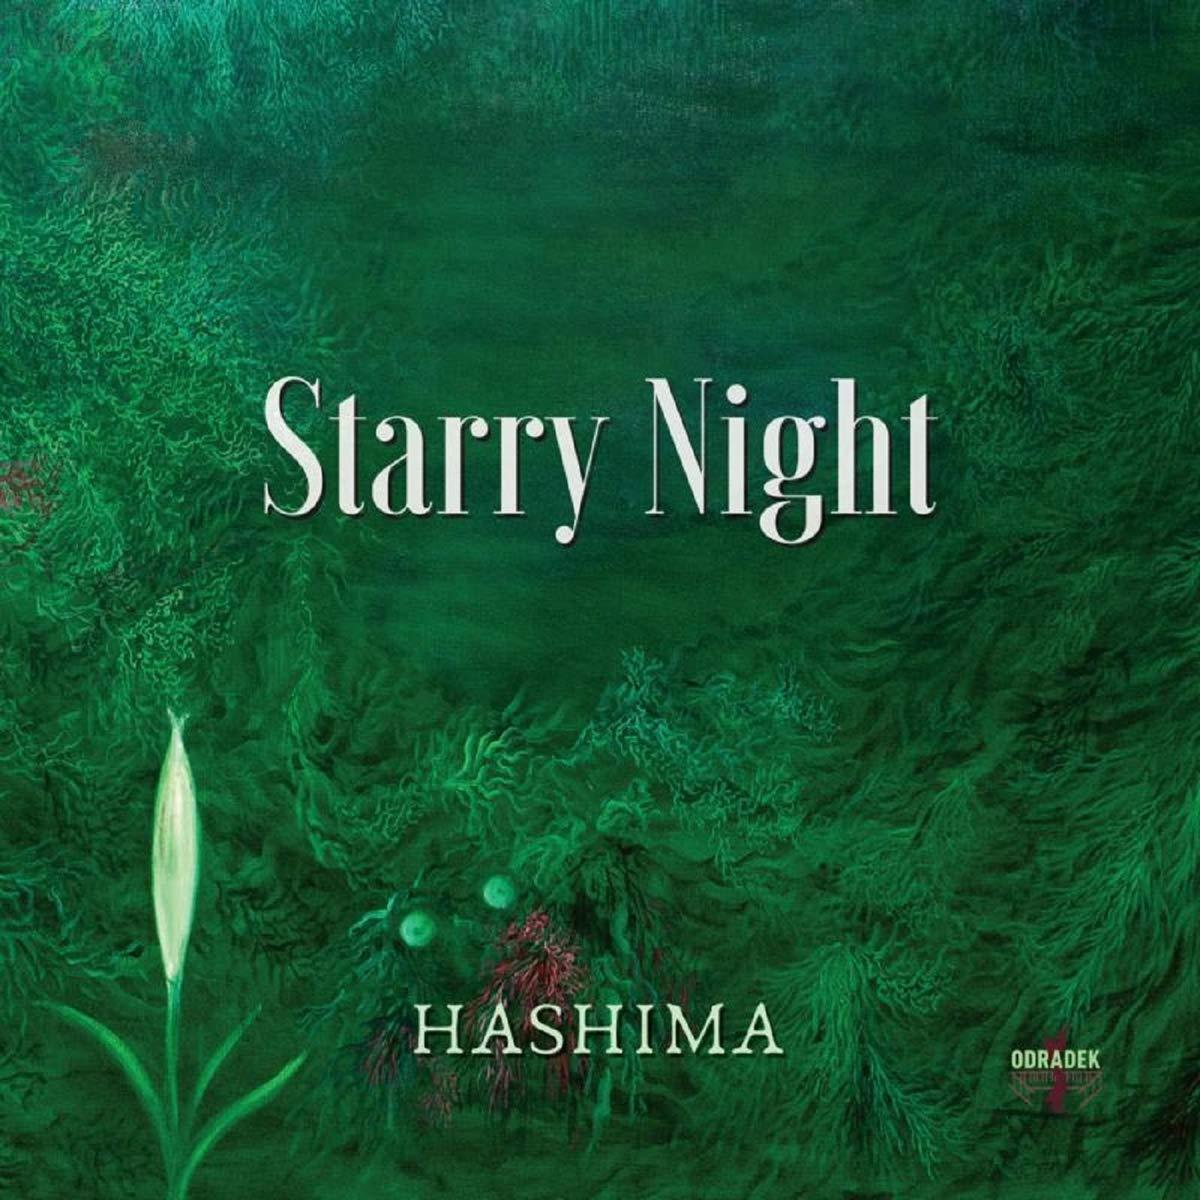 HASHIMA - Starry Night cover